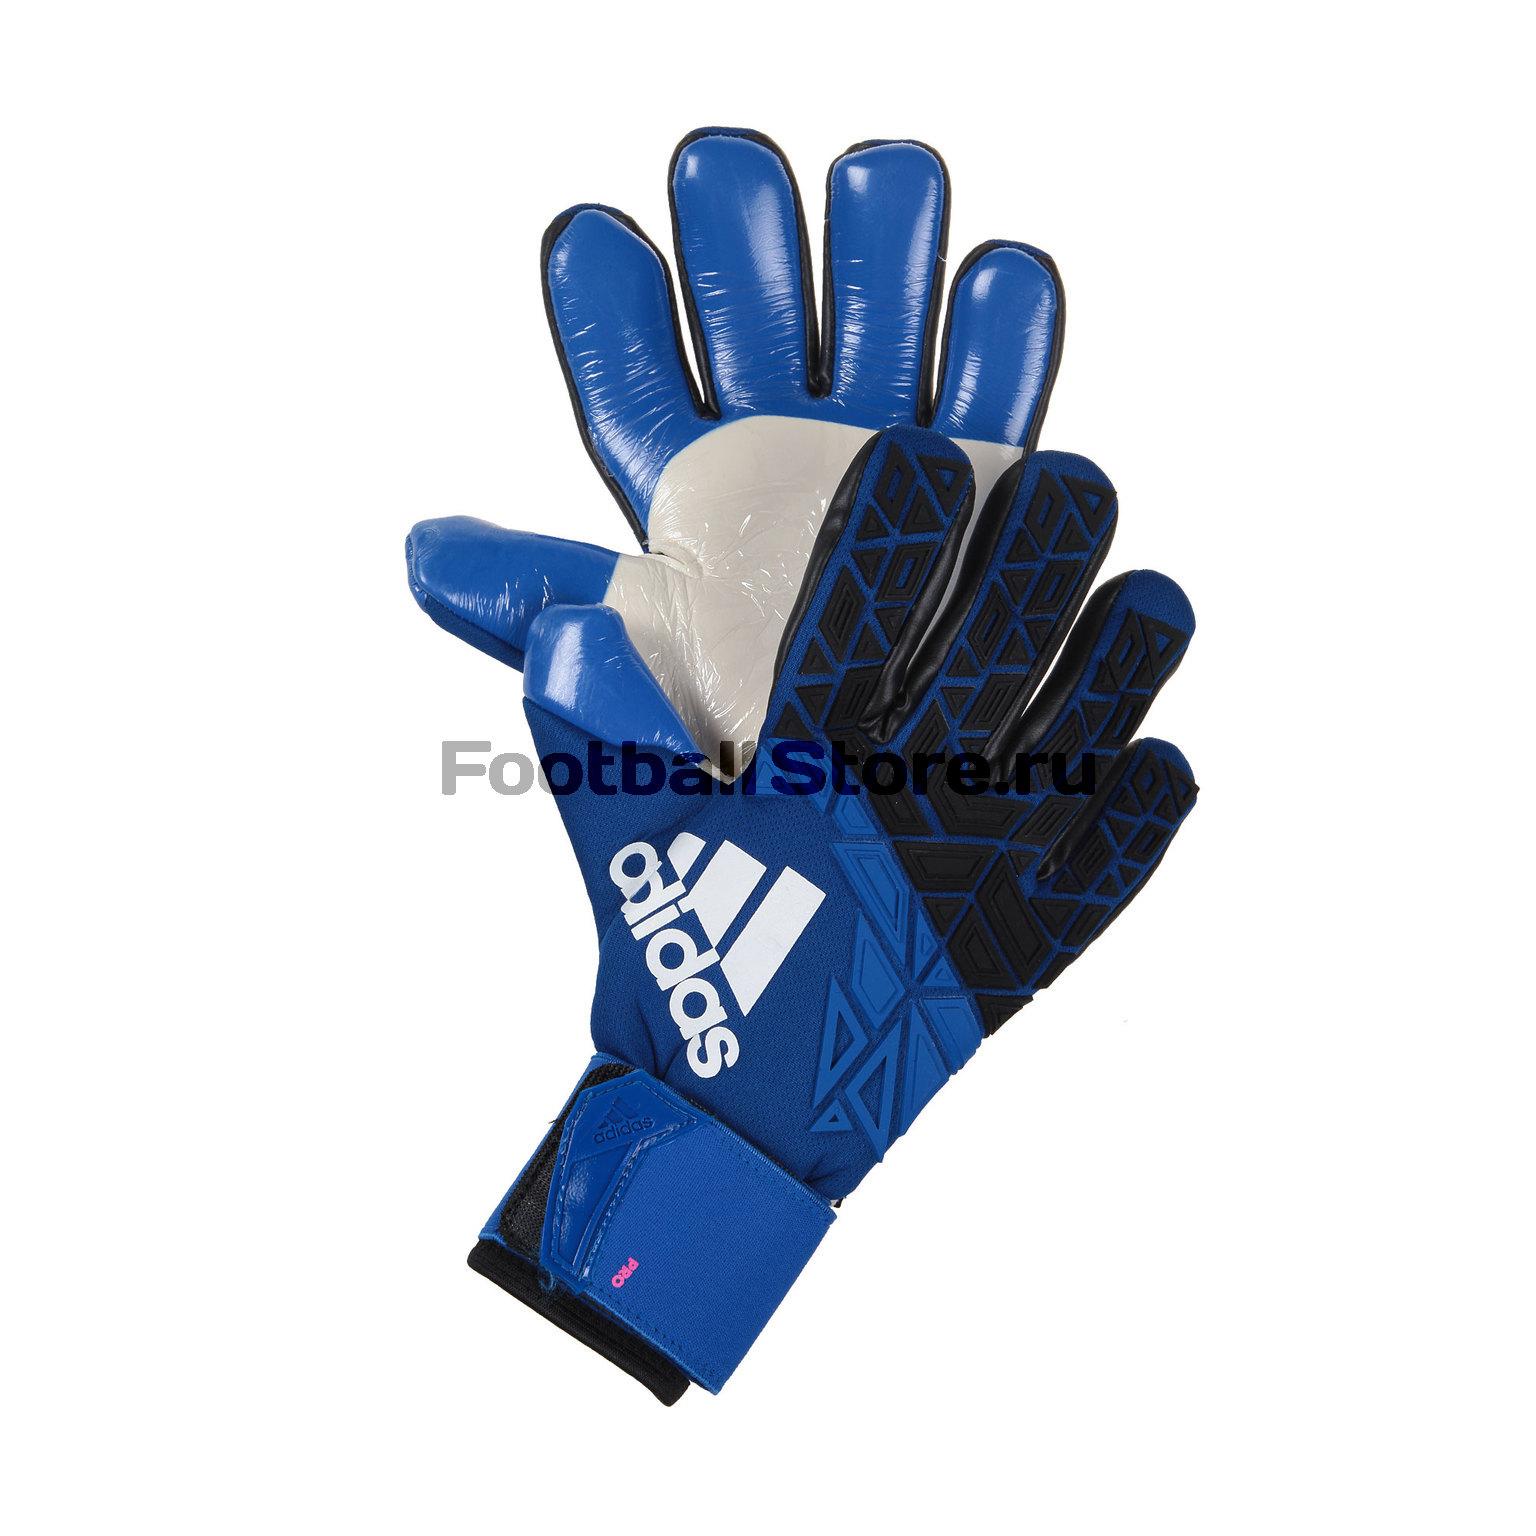 Перчатки вратарские Adidas Ace Trans Pro AZ3691 перчатки вратарские adidas ace half neg az3688